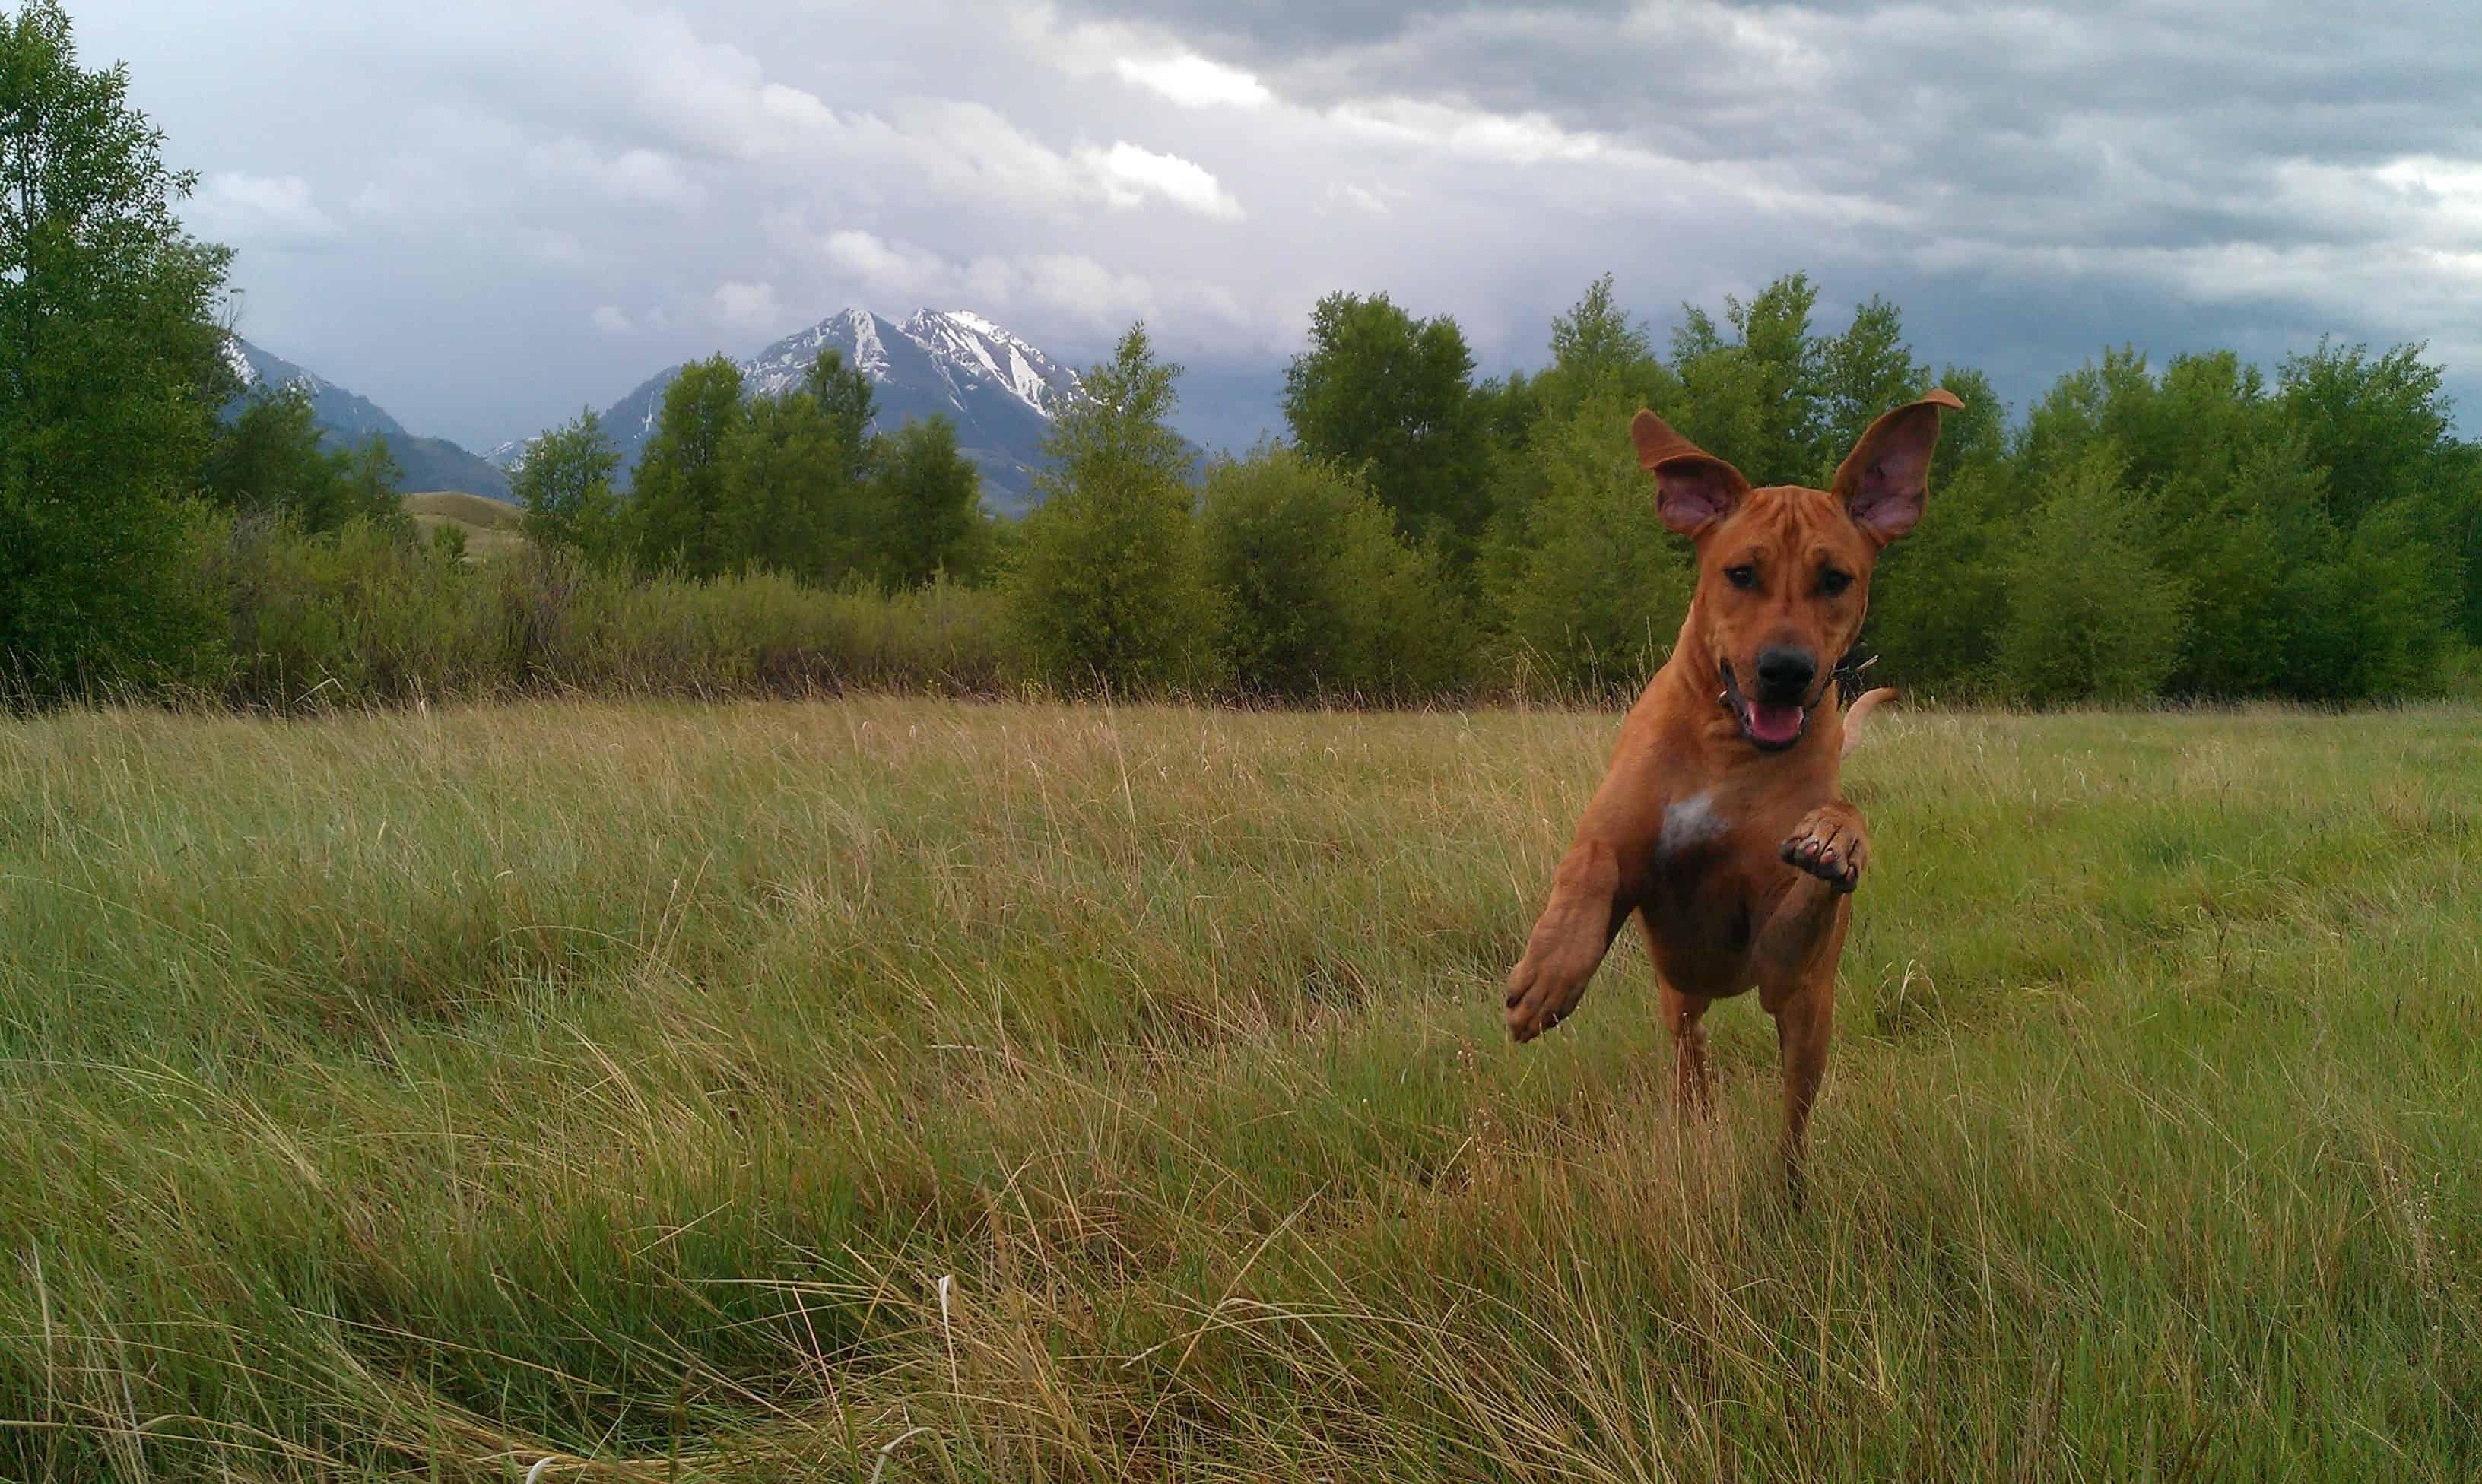 Rhodesian Ridgeback, adventure, marking our territory, chicago, dogs, blog, photo